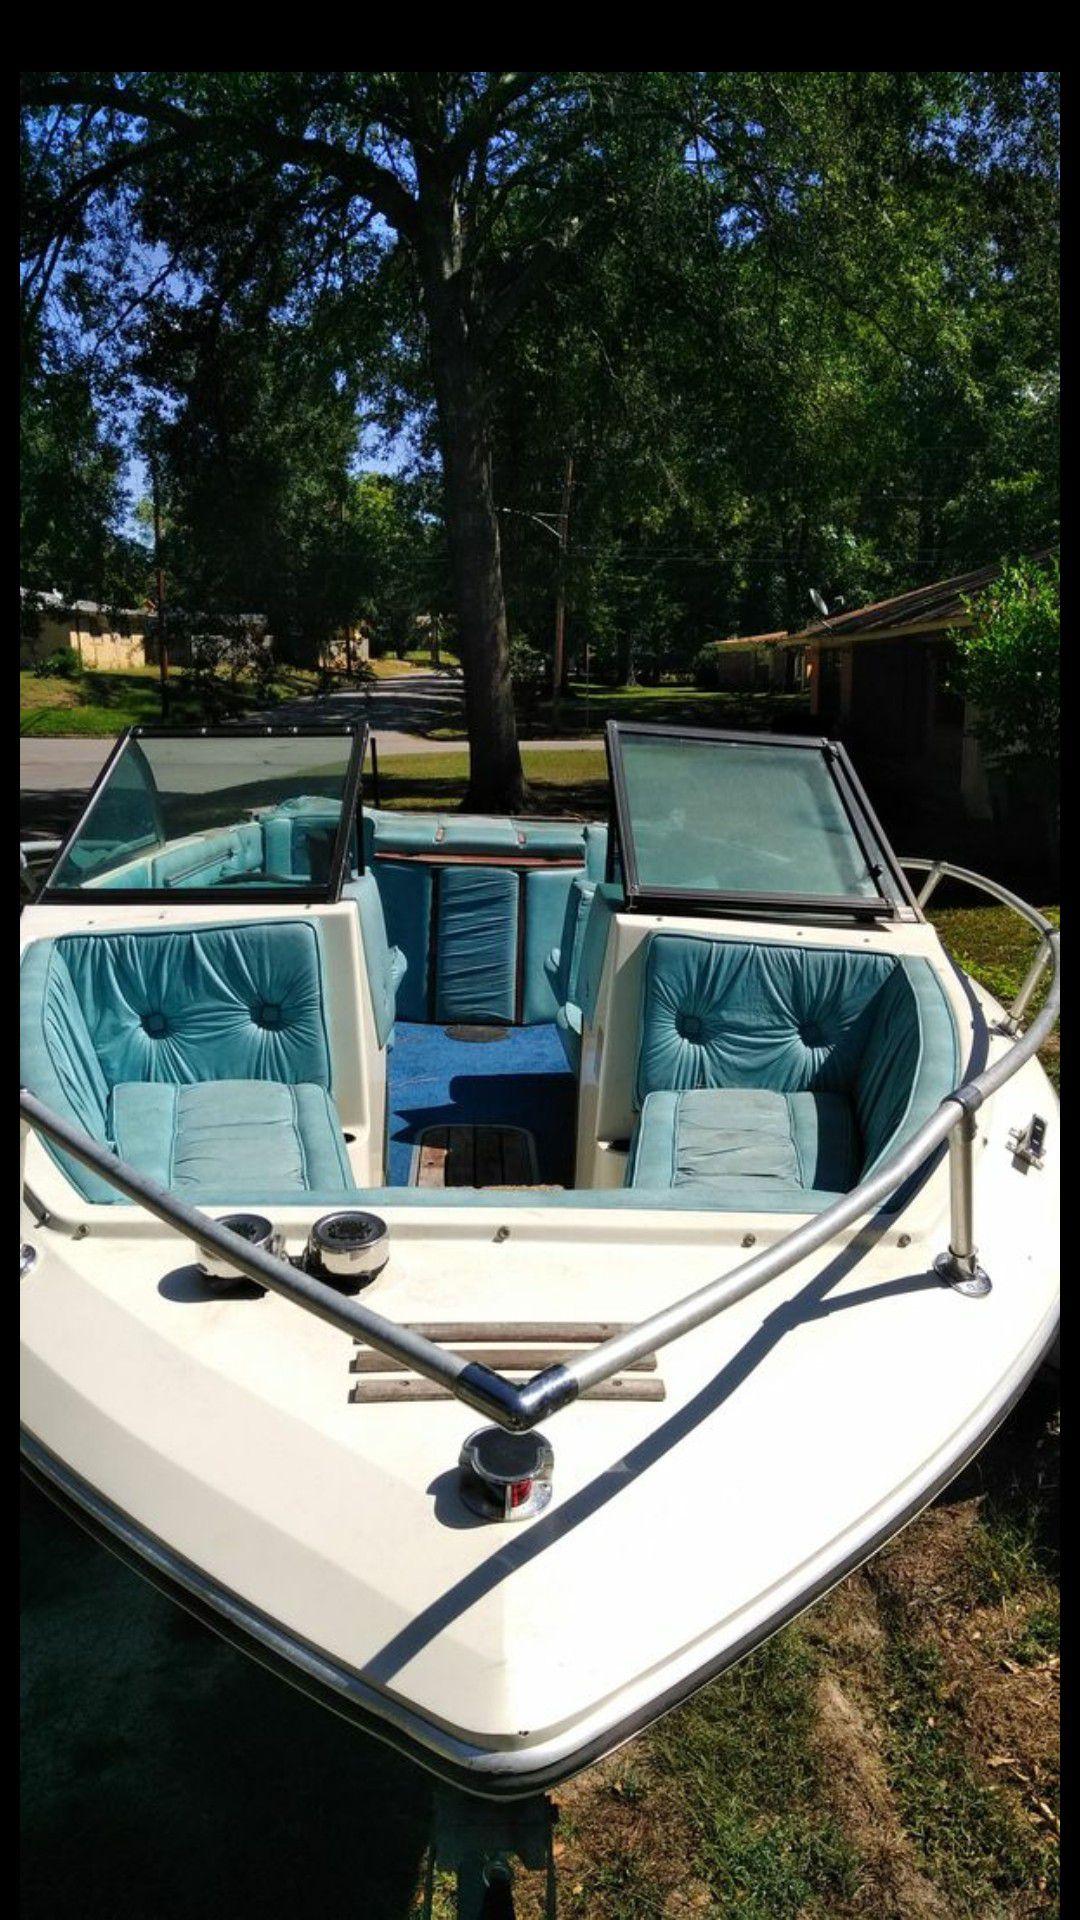 1982 mercruiser celebrity boat I/O